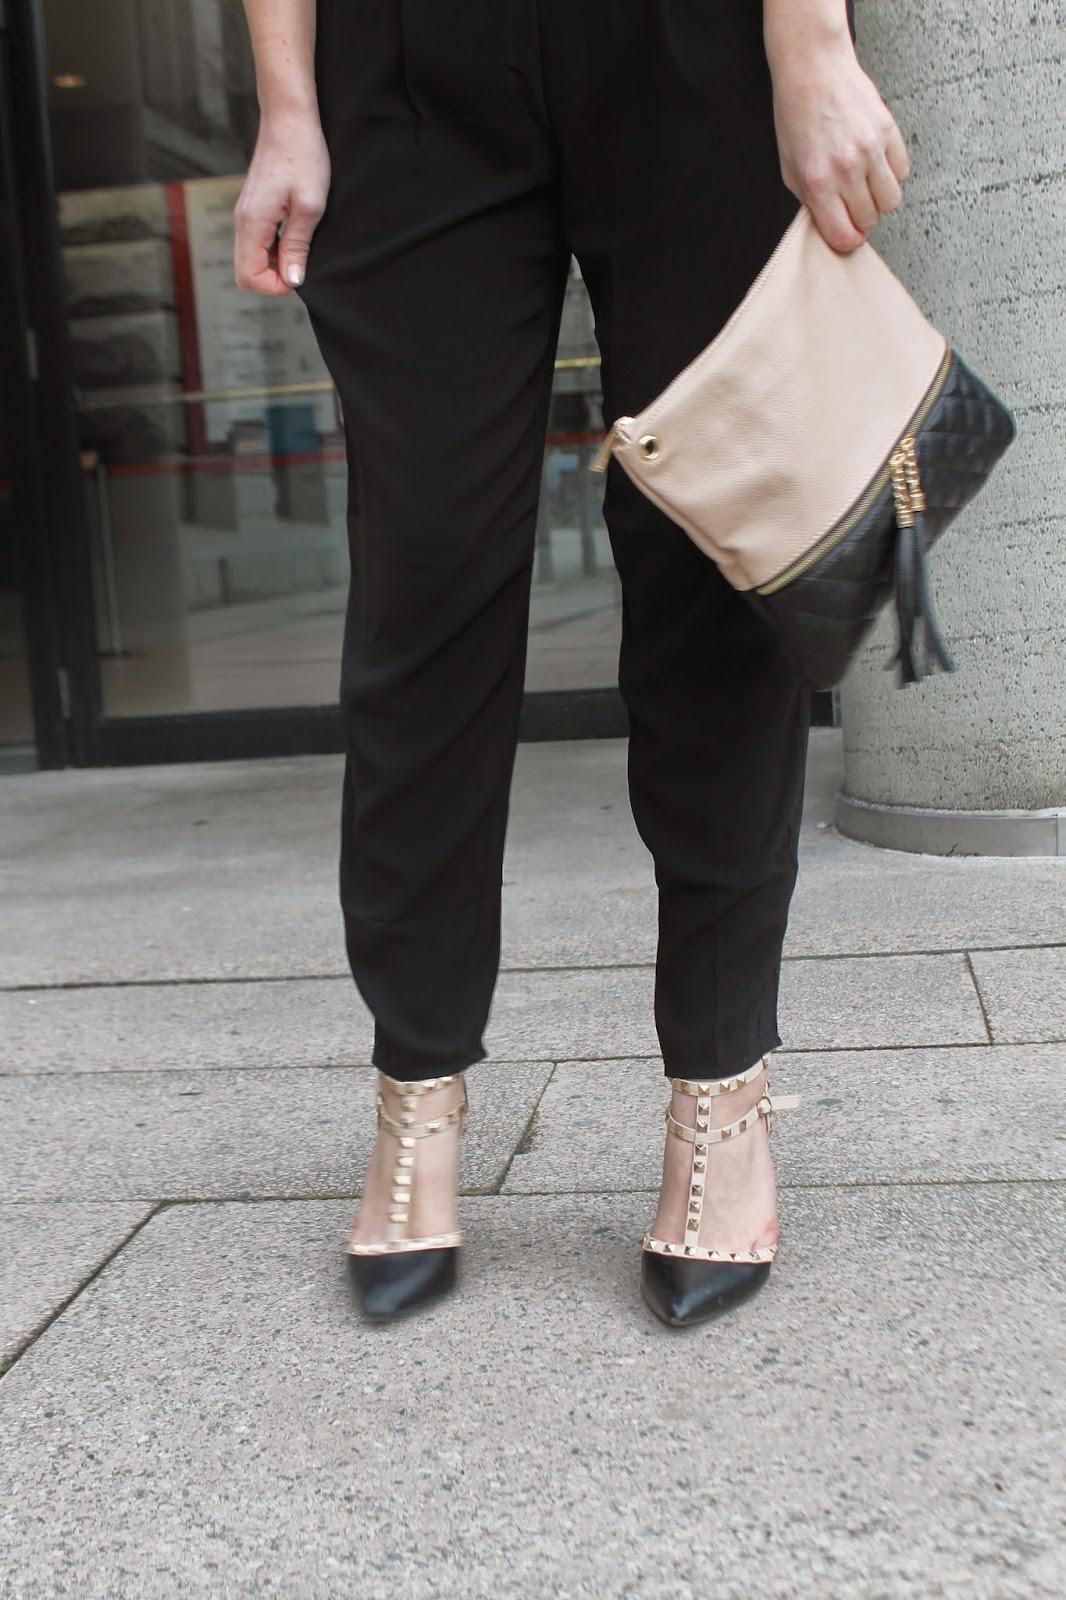 similar-heels-valentino-rock-studs